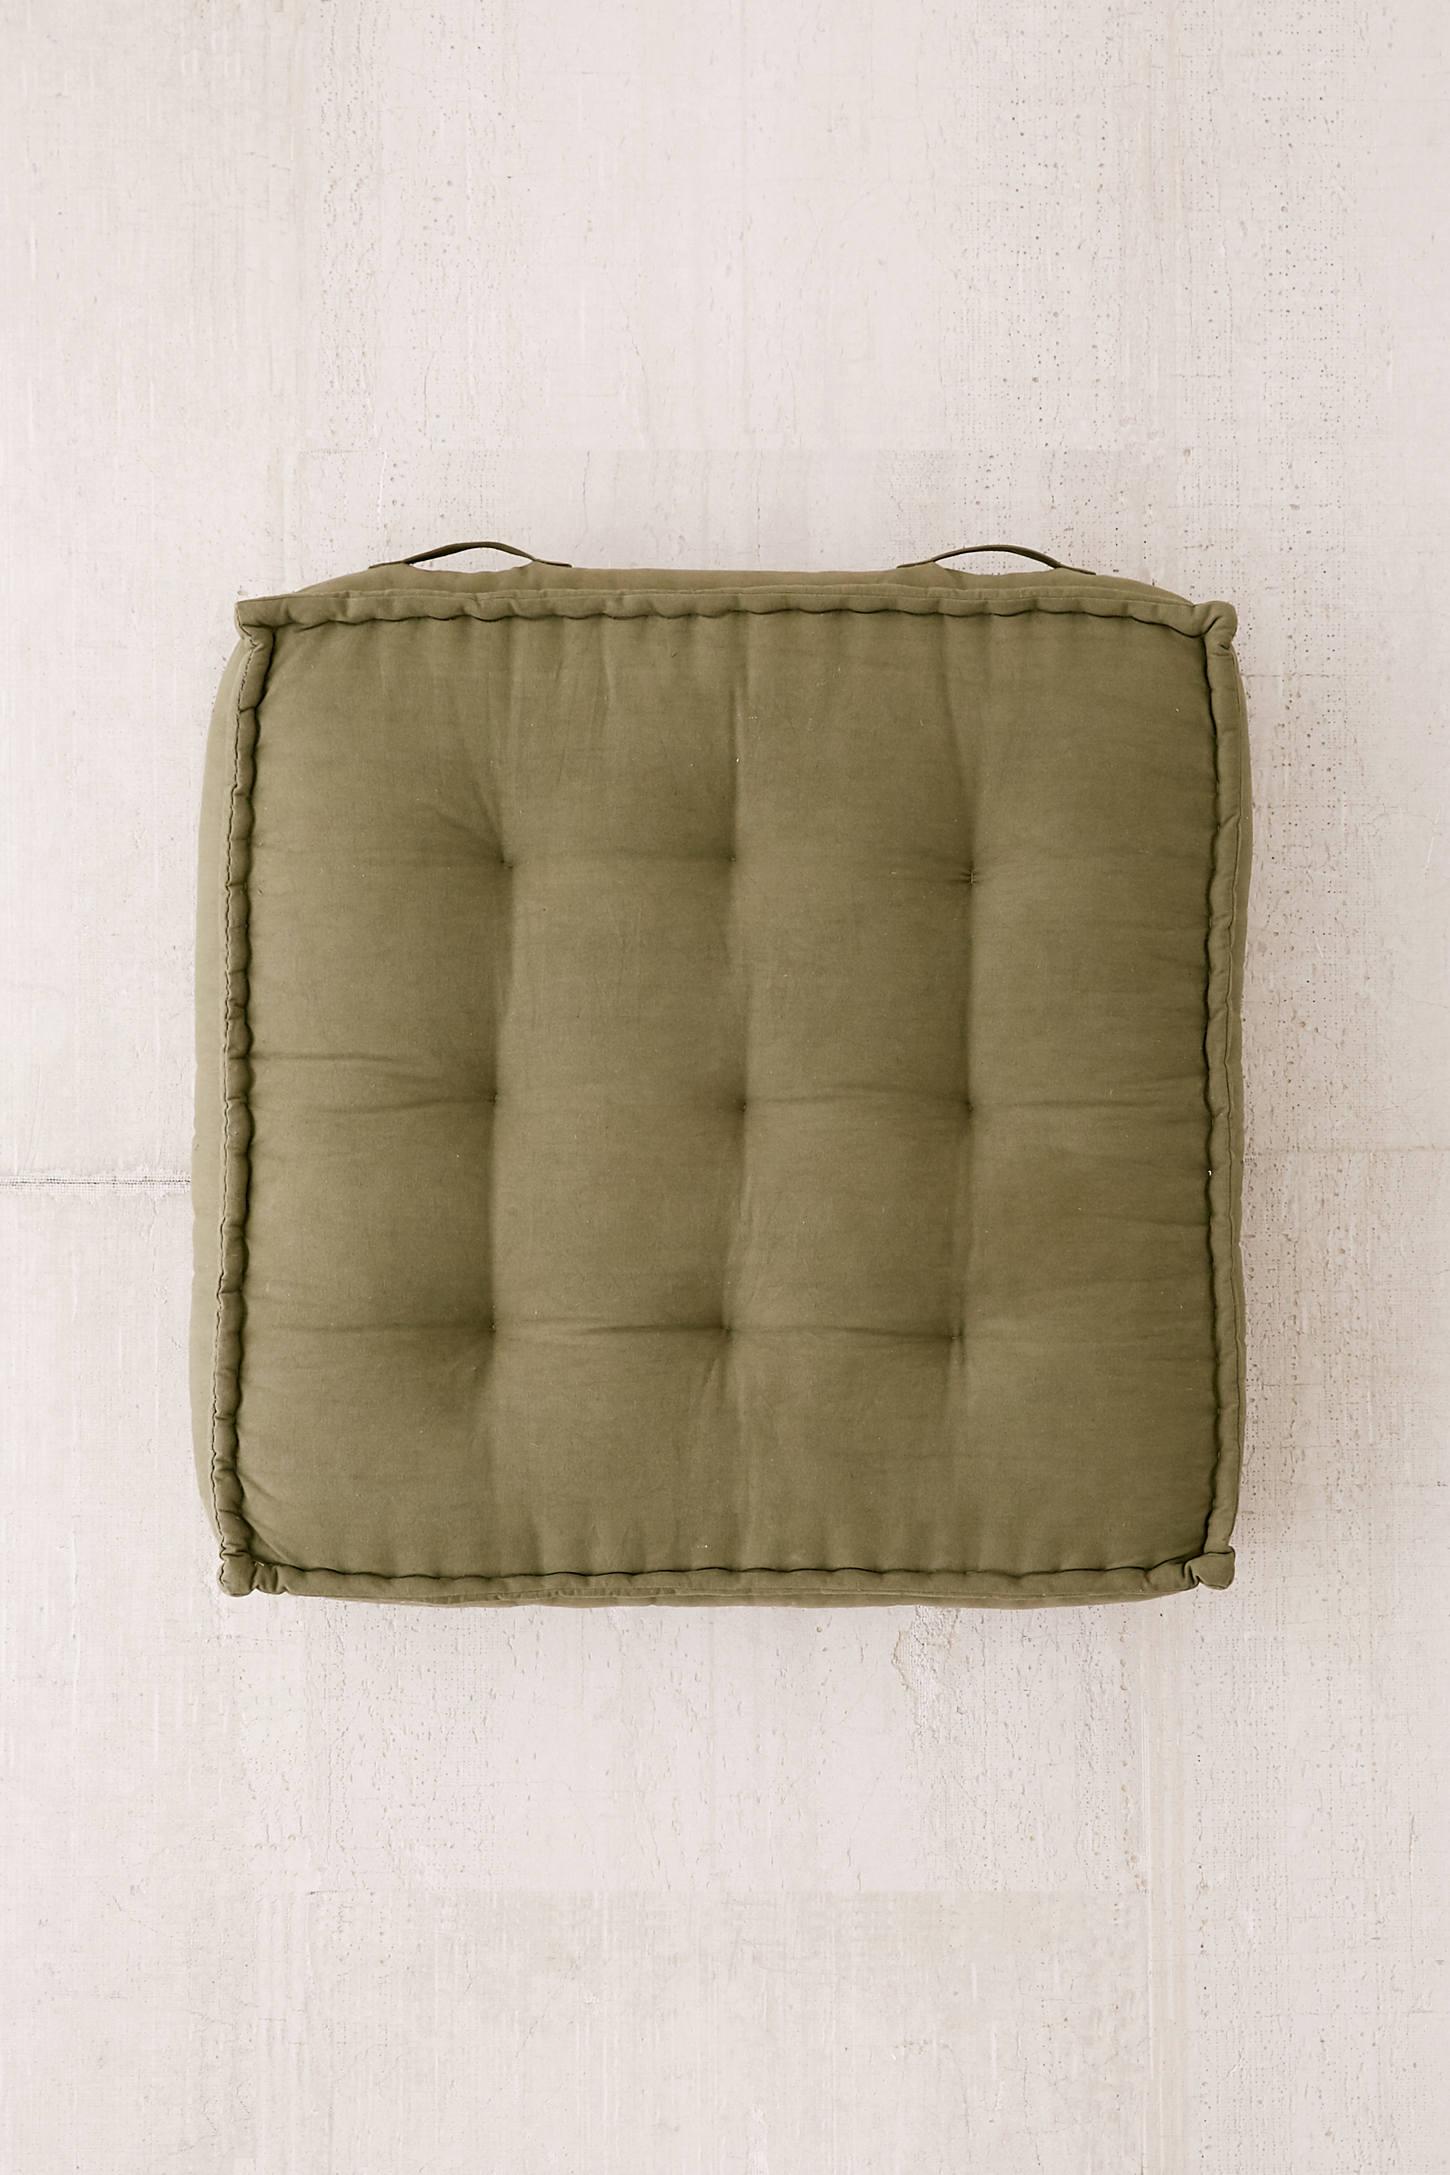 Cushion Floor For Kitchens Reema Floor Cushion Urban Outfitters